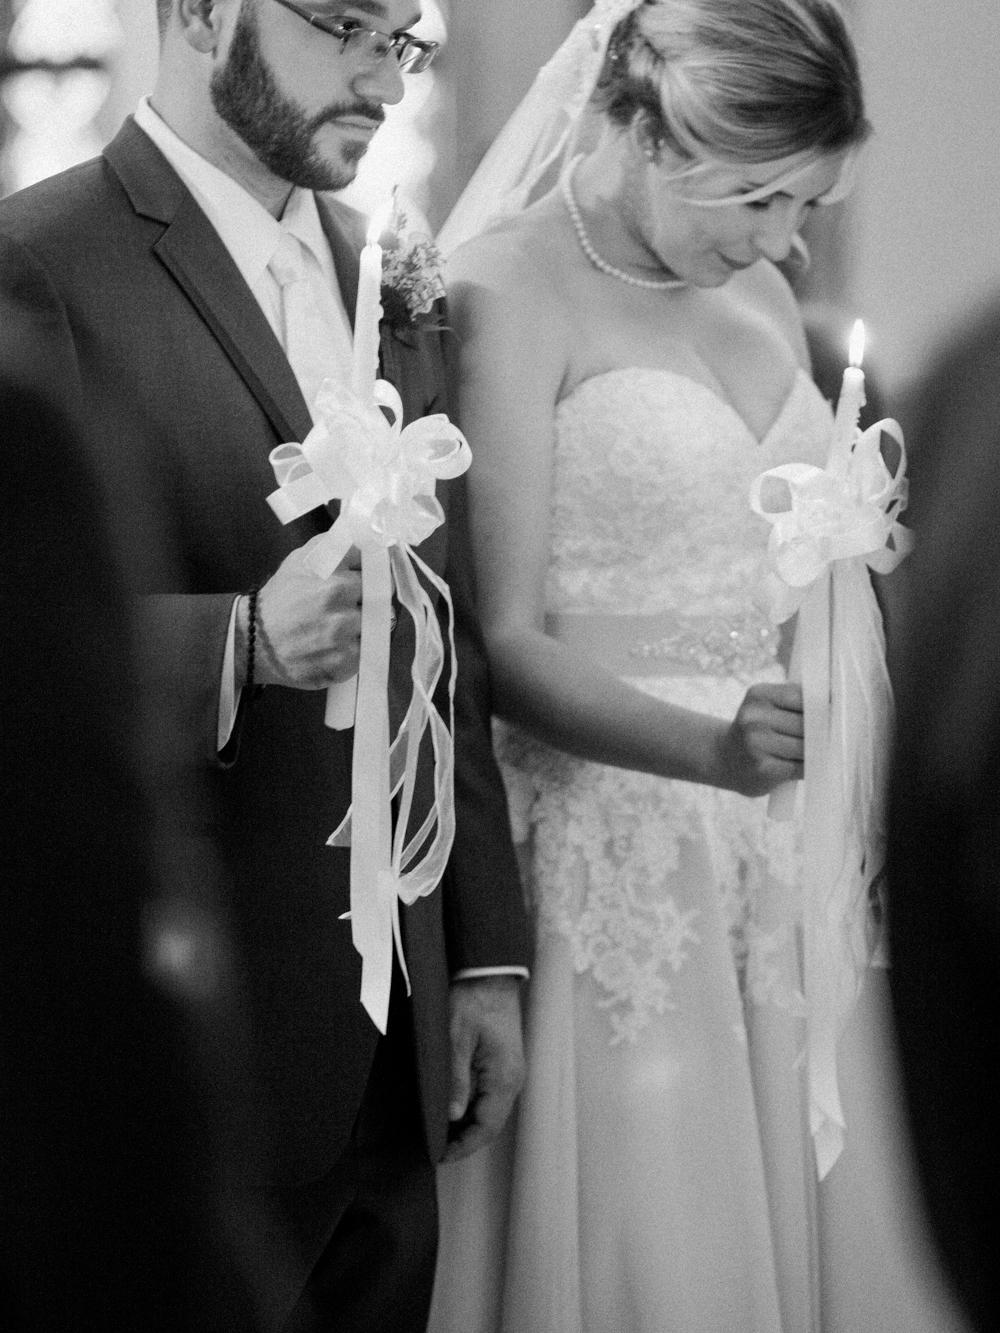 Houston wedding photographer - Christine Gosch - Houston film photographer - greek wedding in Houston - Annunciation Greek Orthodox church in Houston, Texas - Houston wedding planner -30.jpg